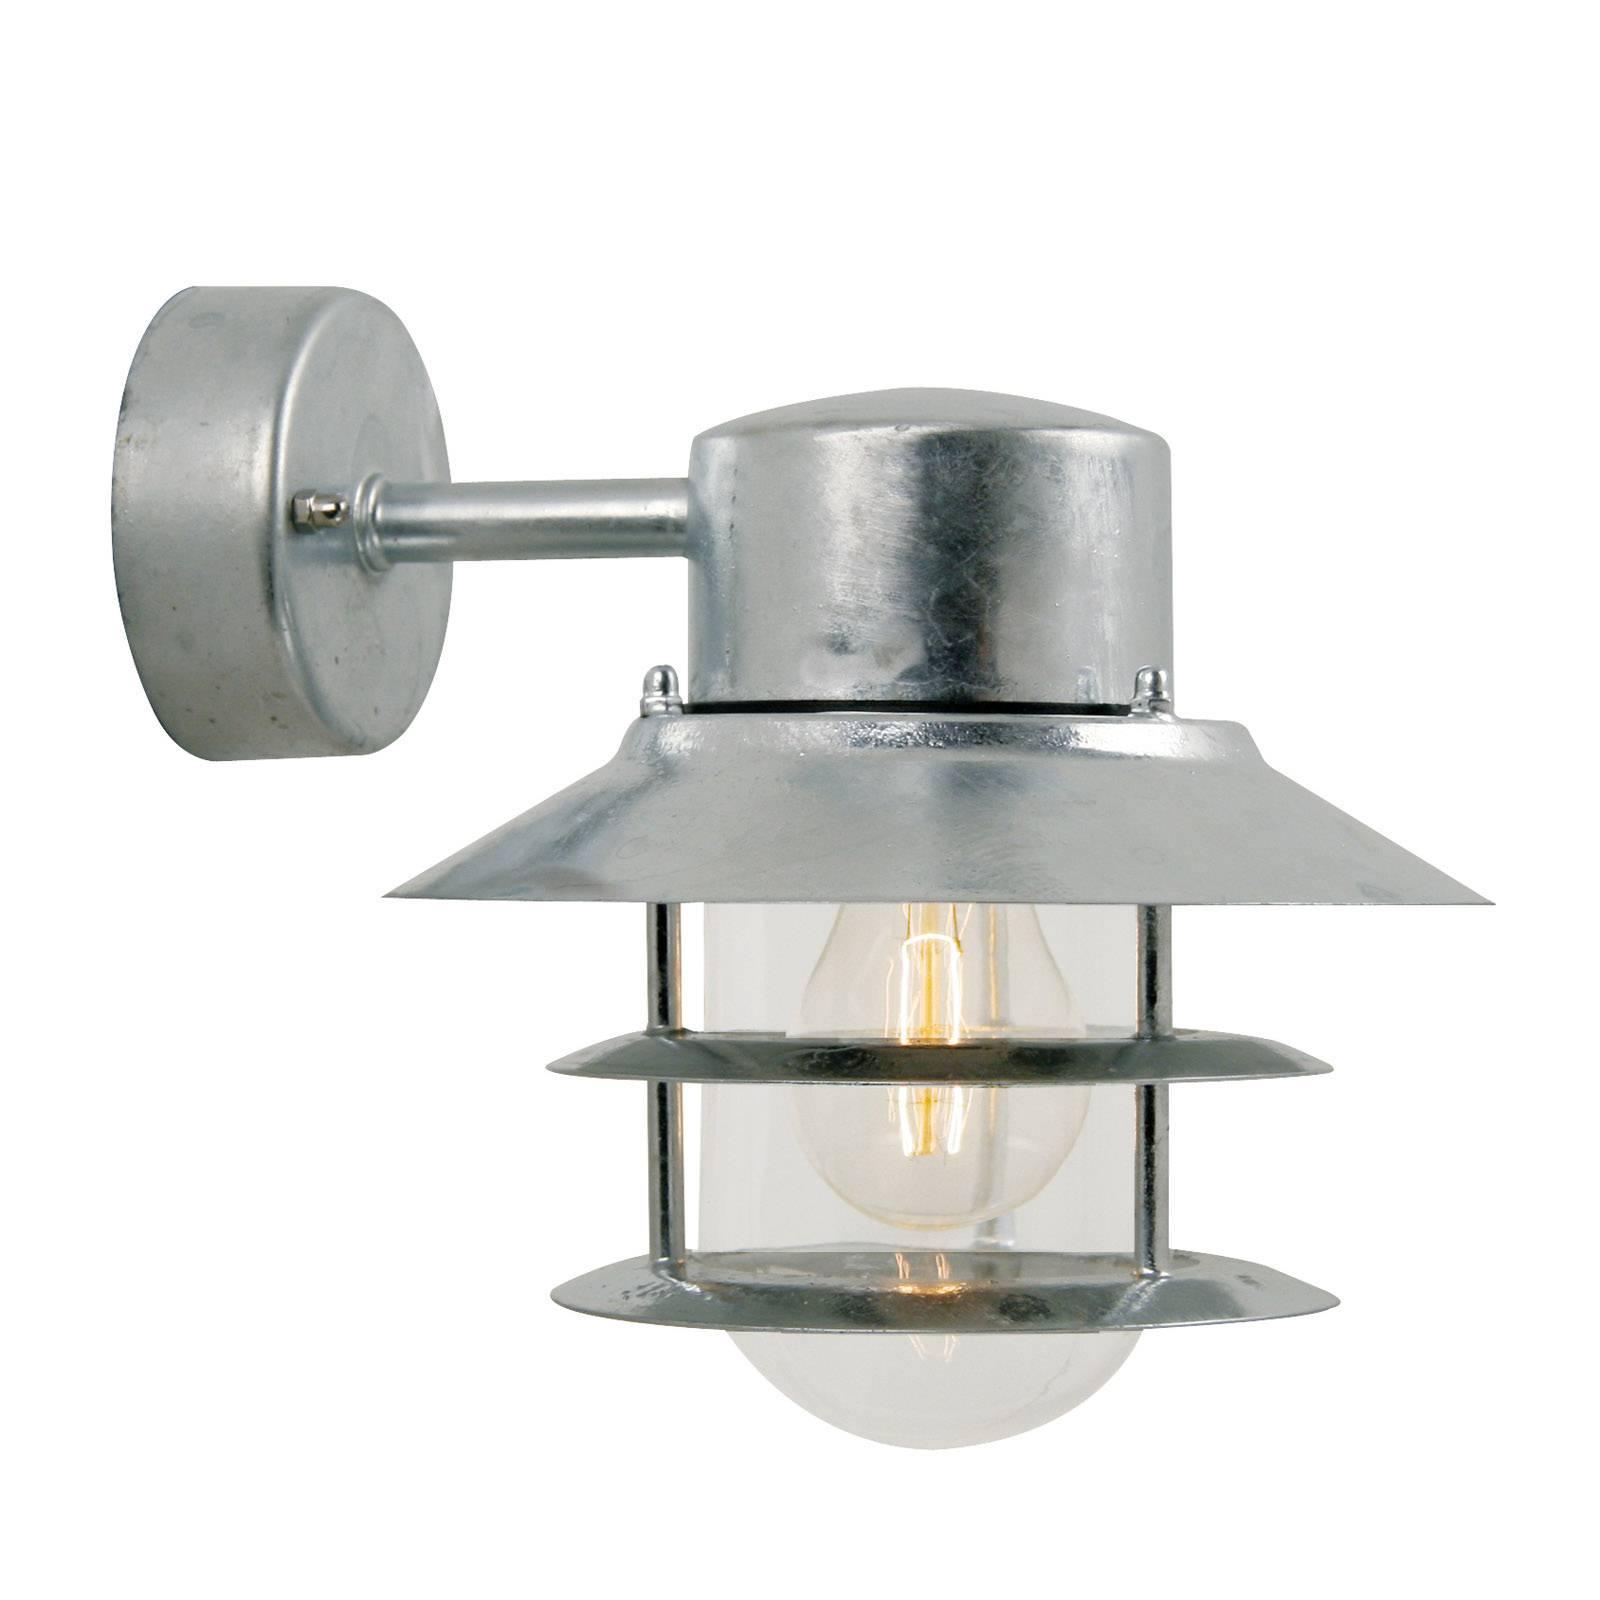 Au enbeleuchtung und andere lampen von nordlux bei for Lampen nordlux